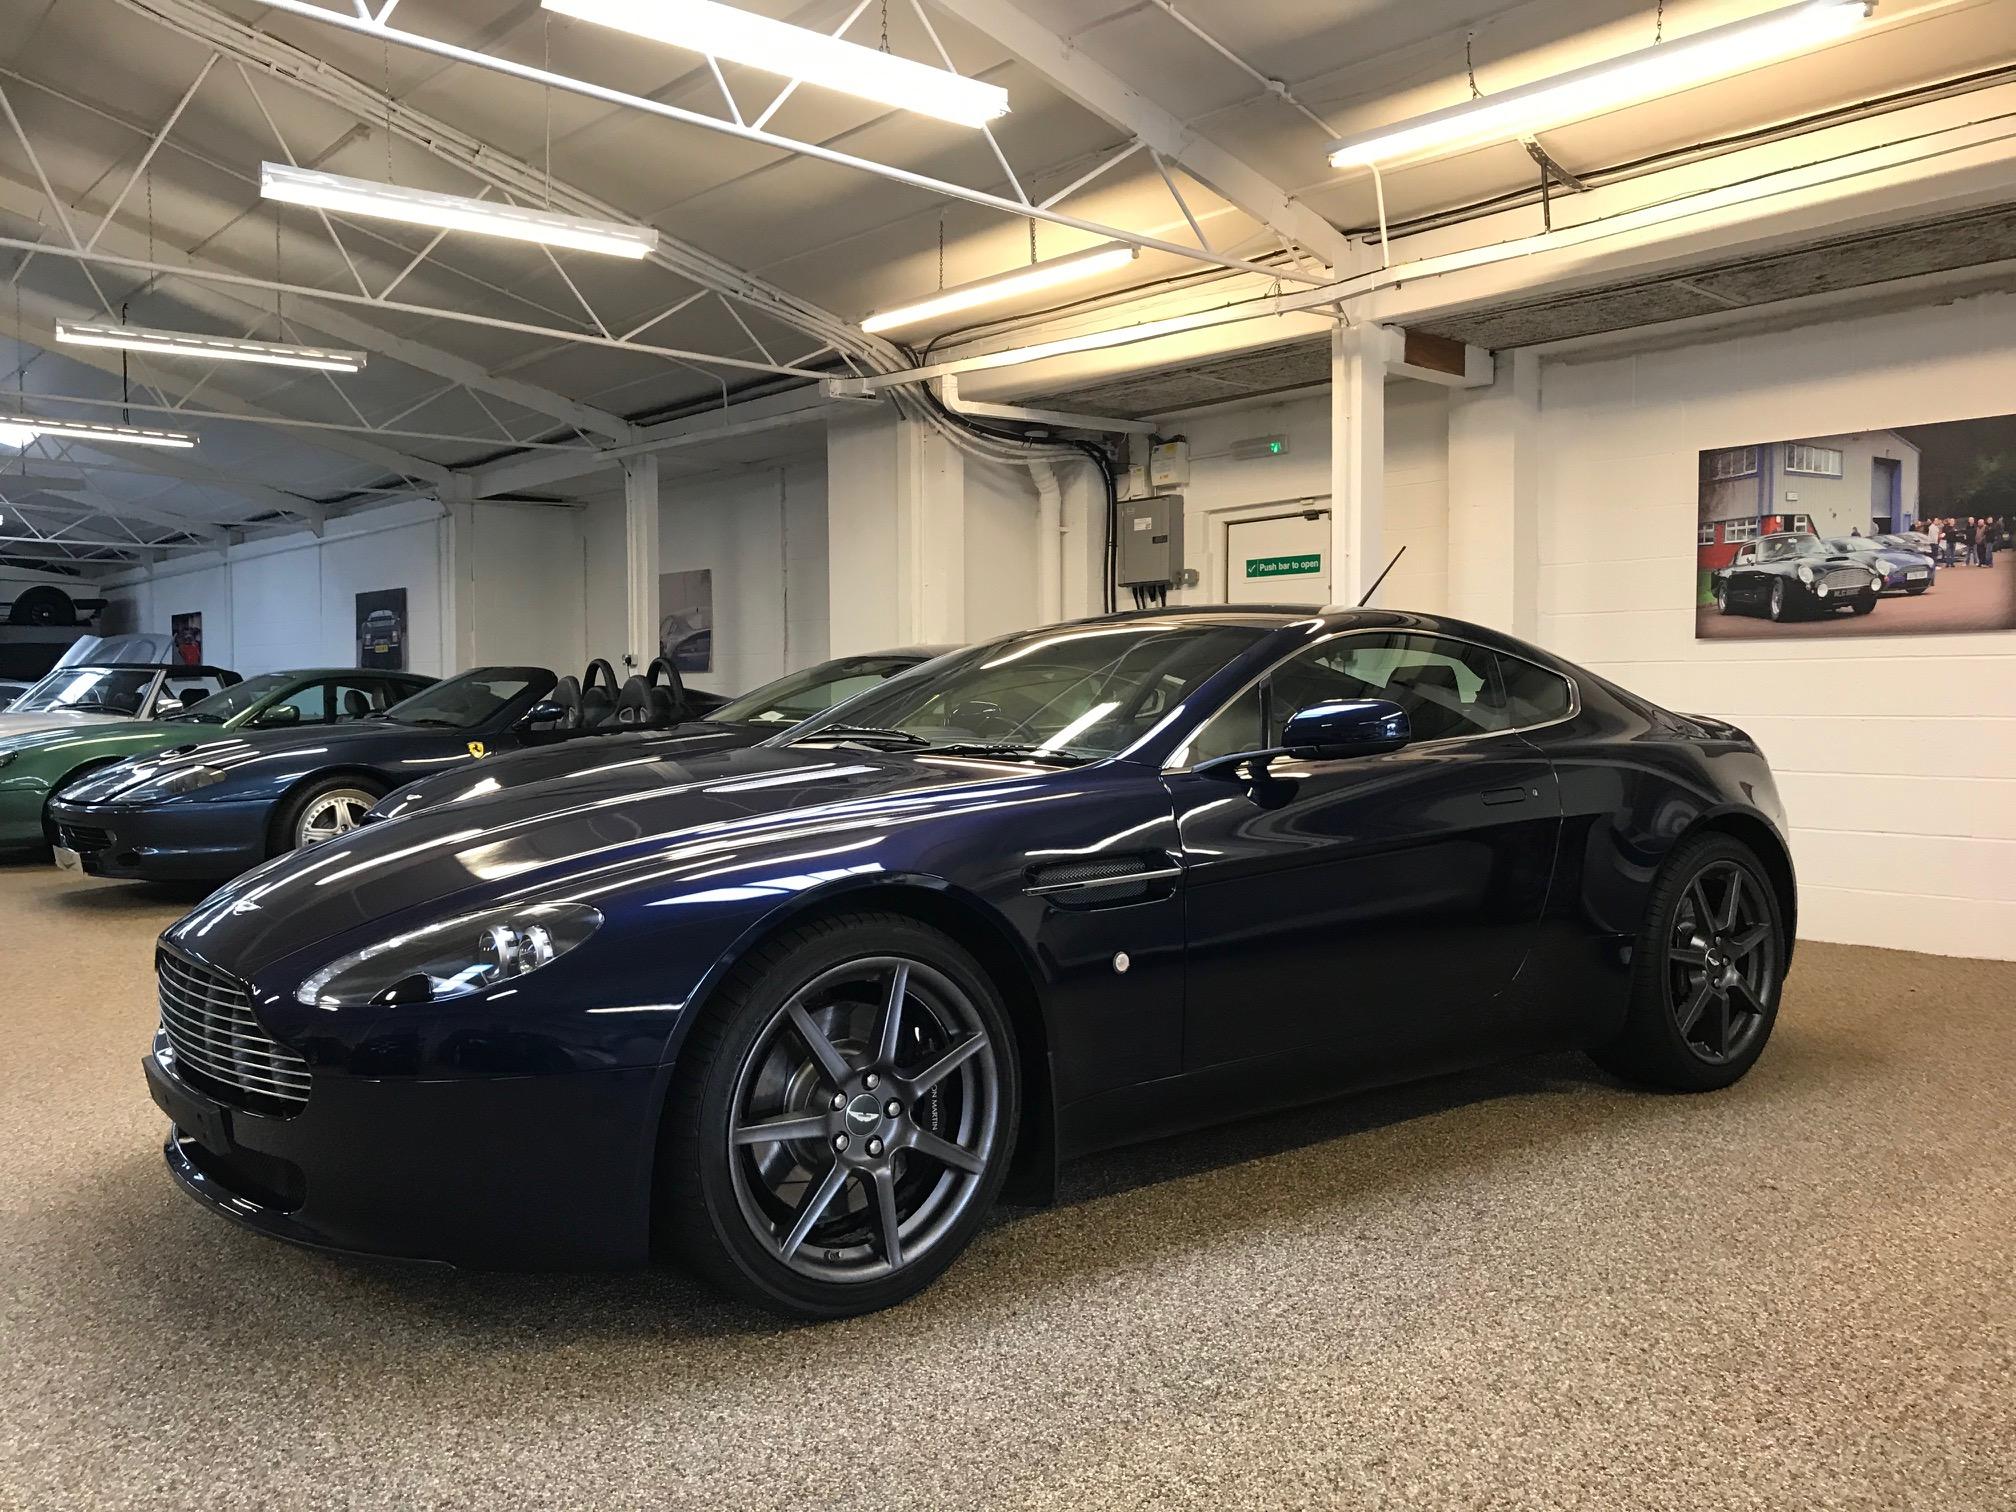 Aston Martin Vantage 4 3 Mcgurk Performance Cars